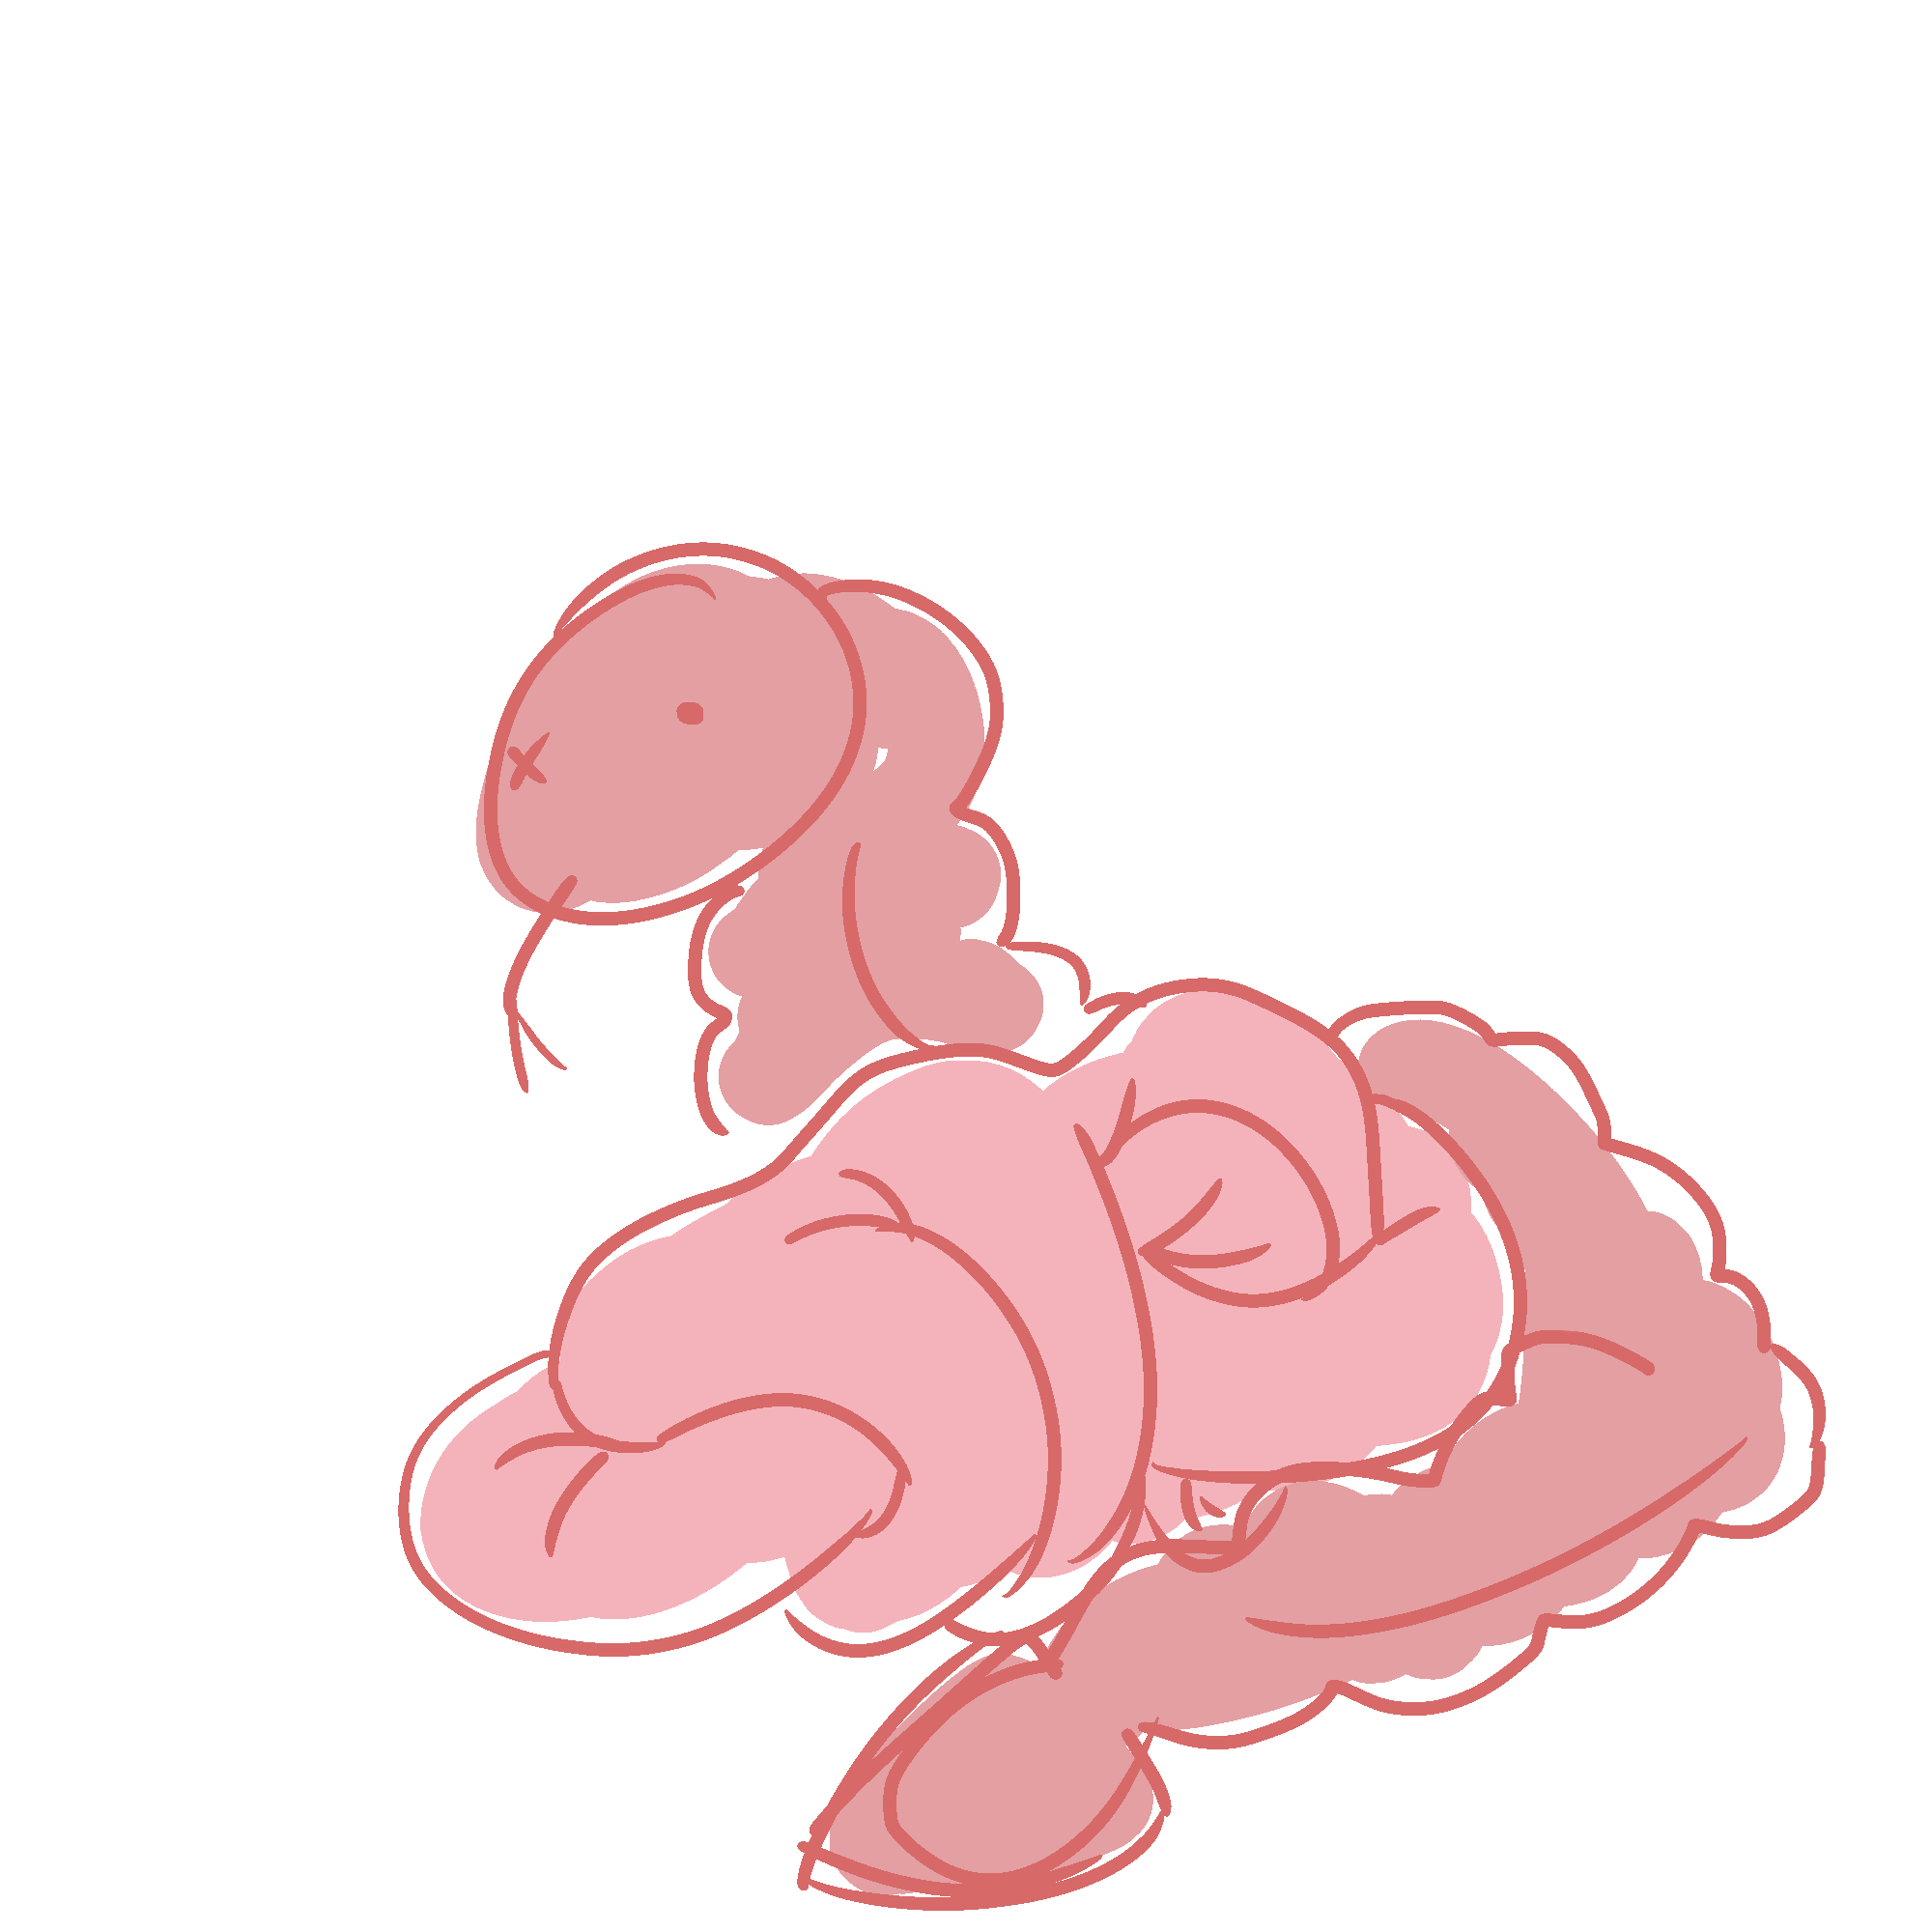 Doodle of bowels